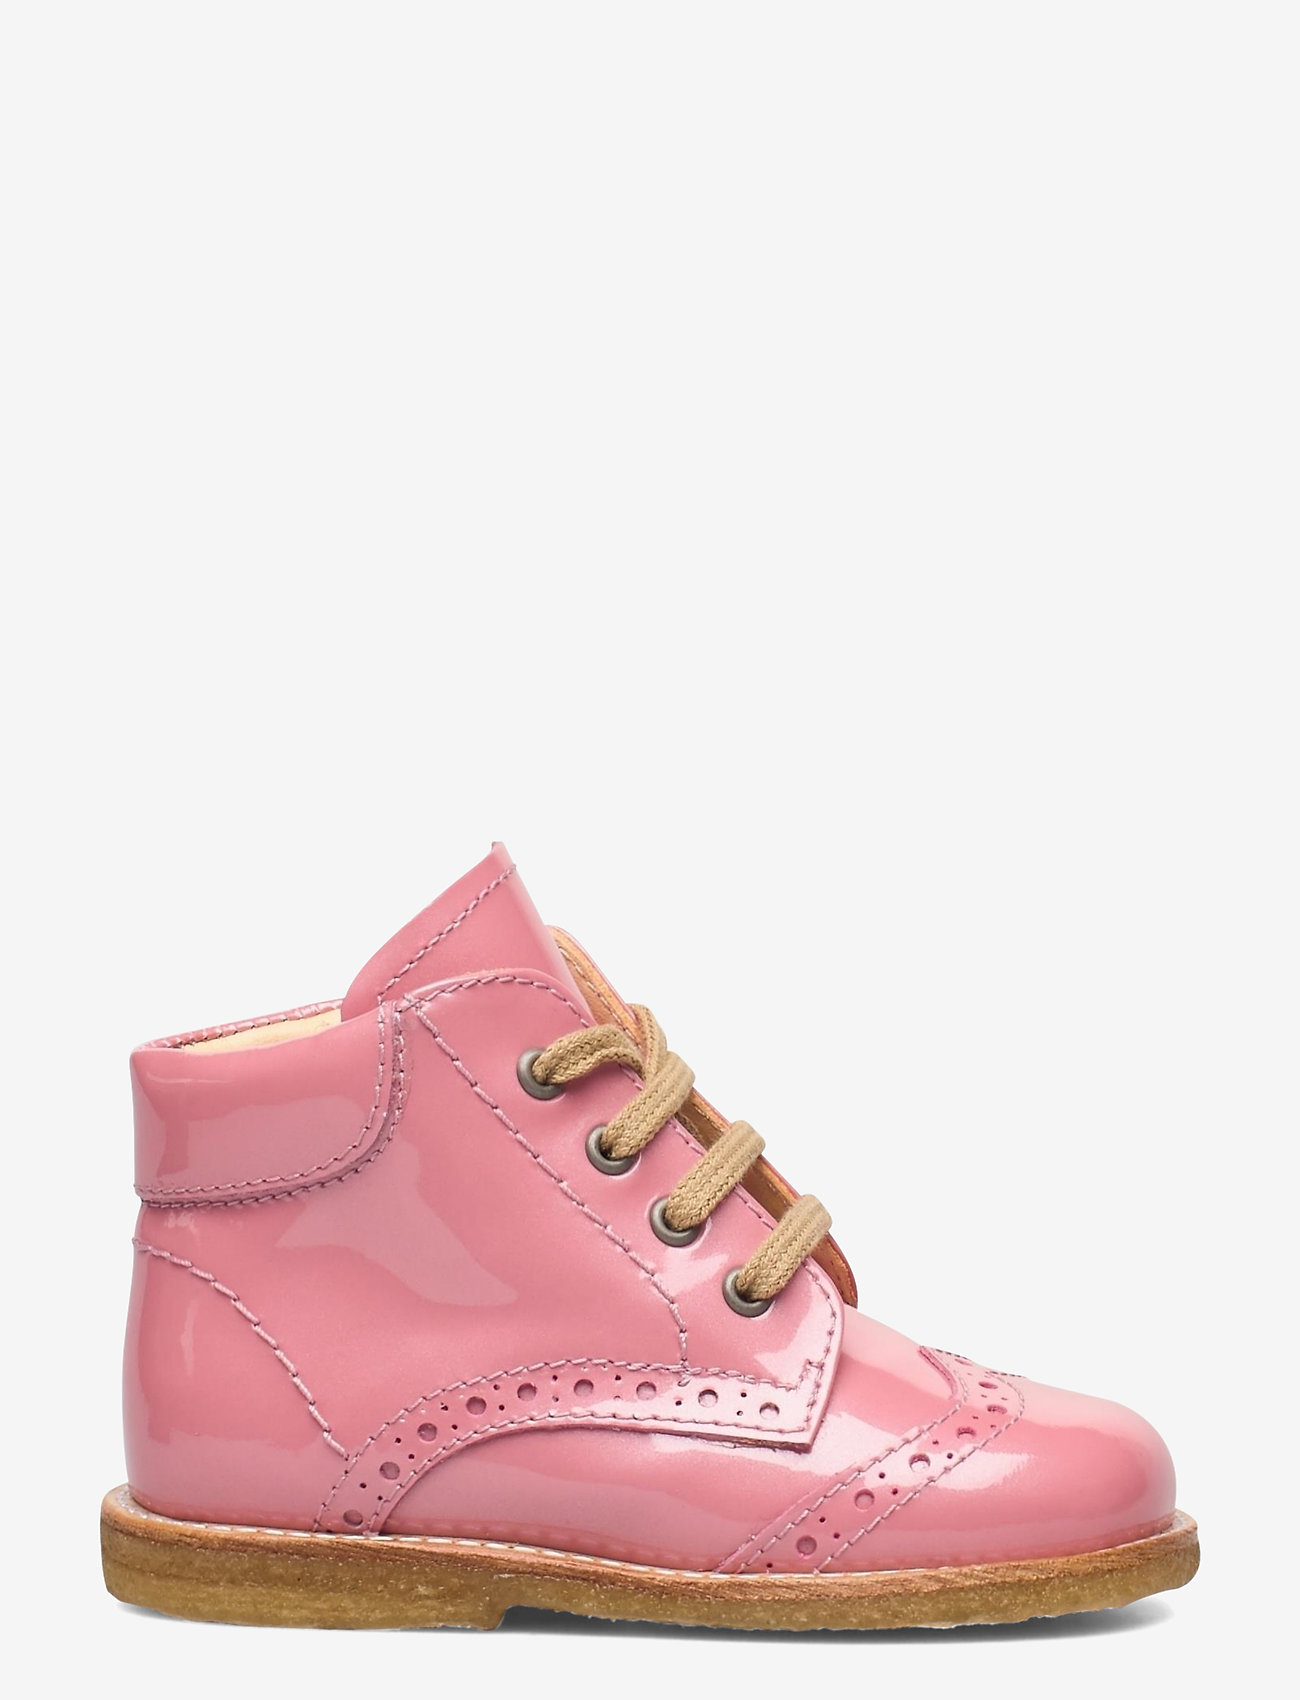 ANGULUS - Shoes - flat - with lace - lauflernschuhe - 2389 rose pink - 1